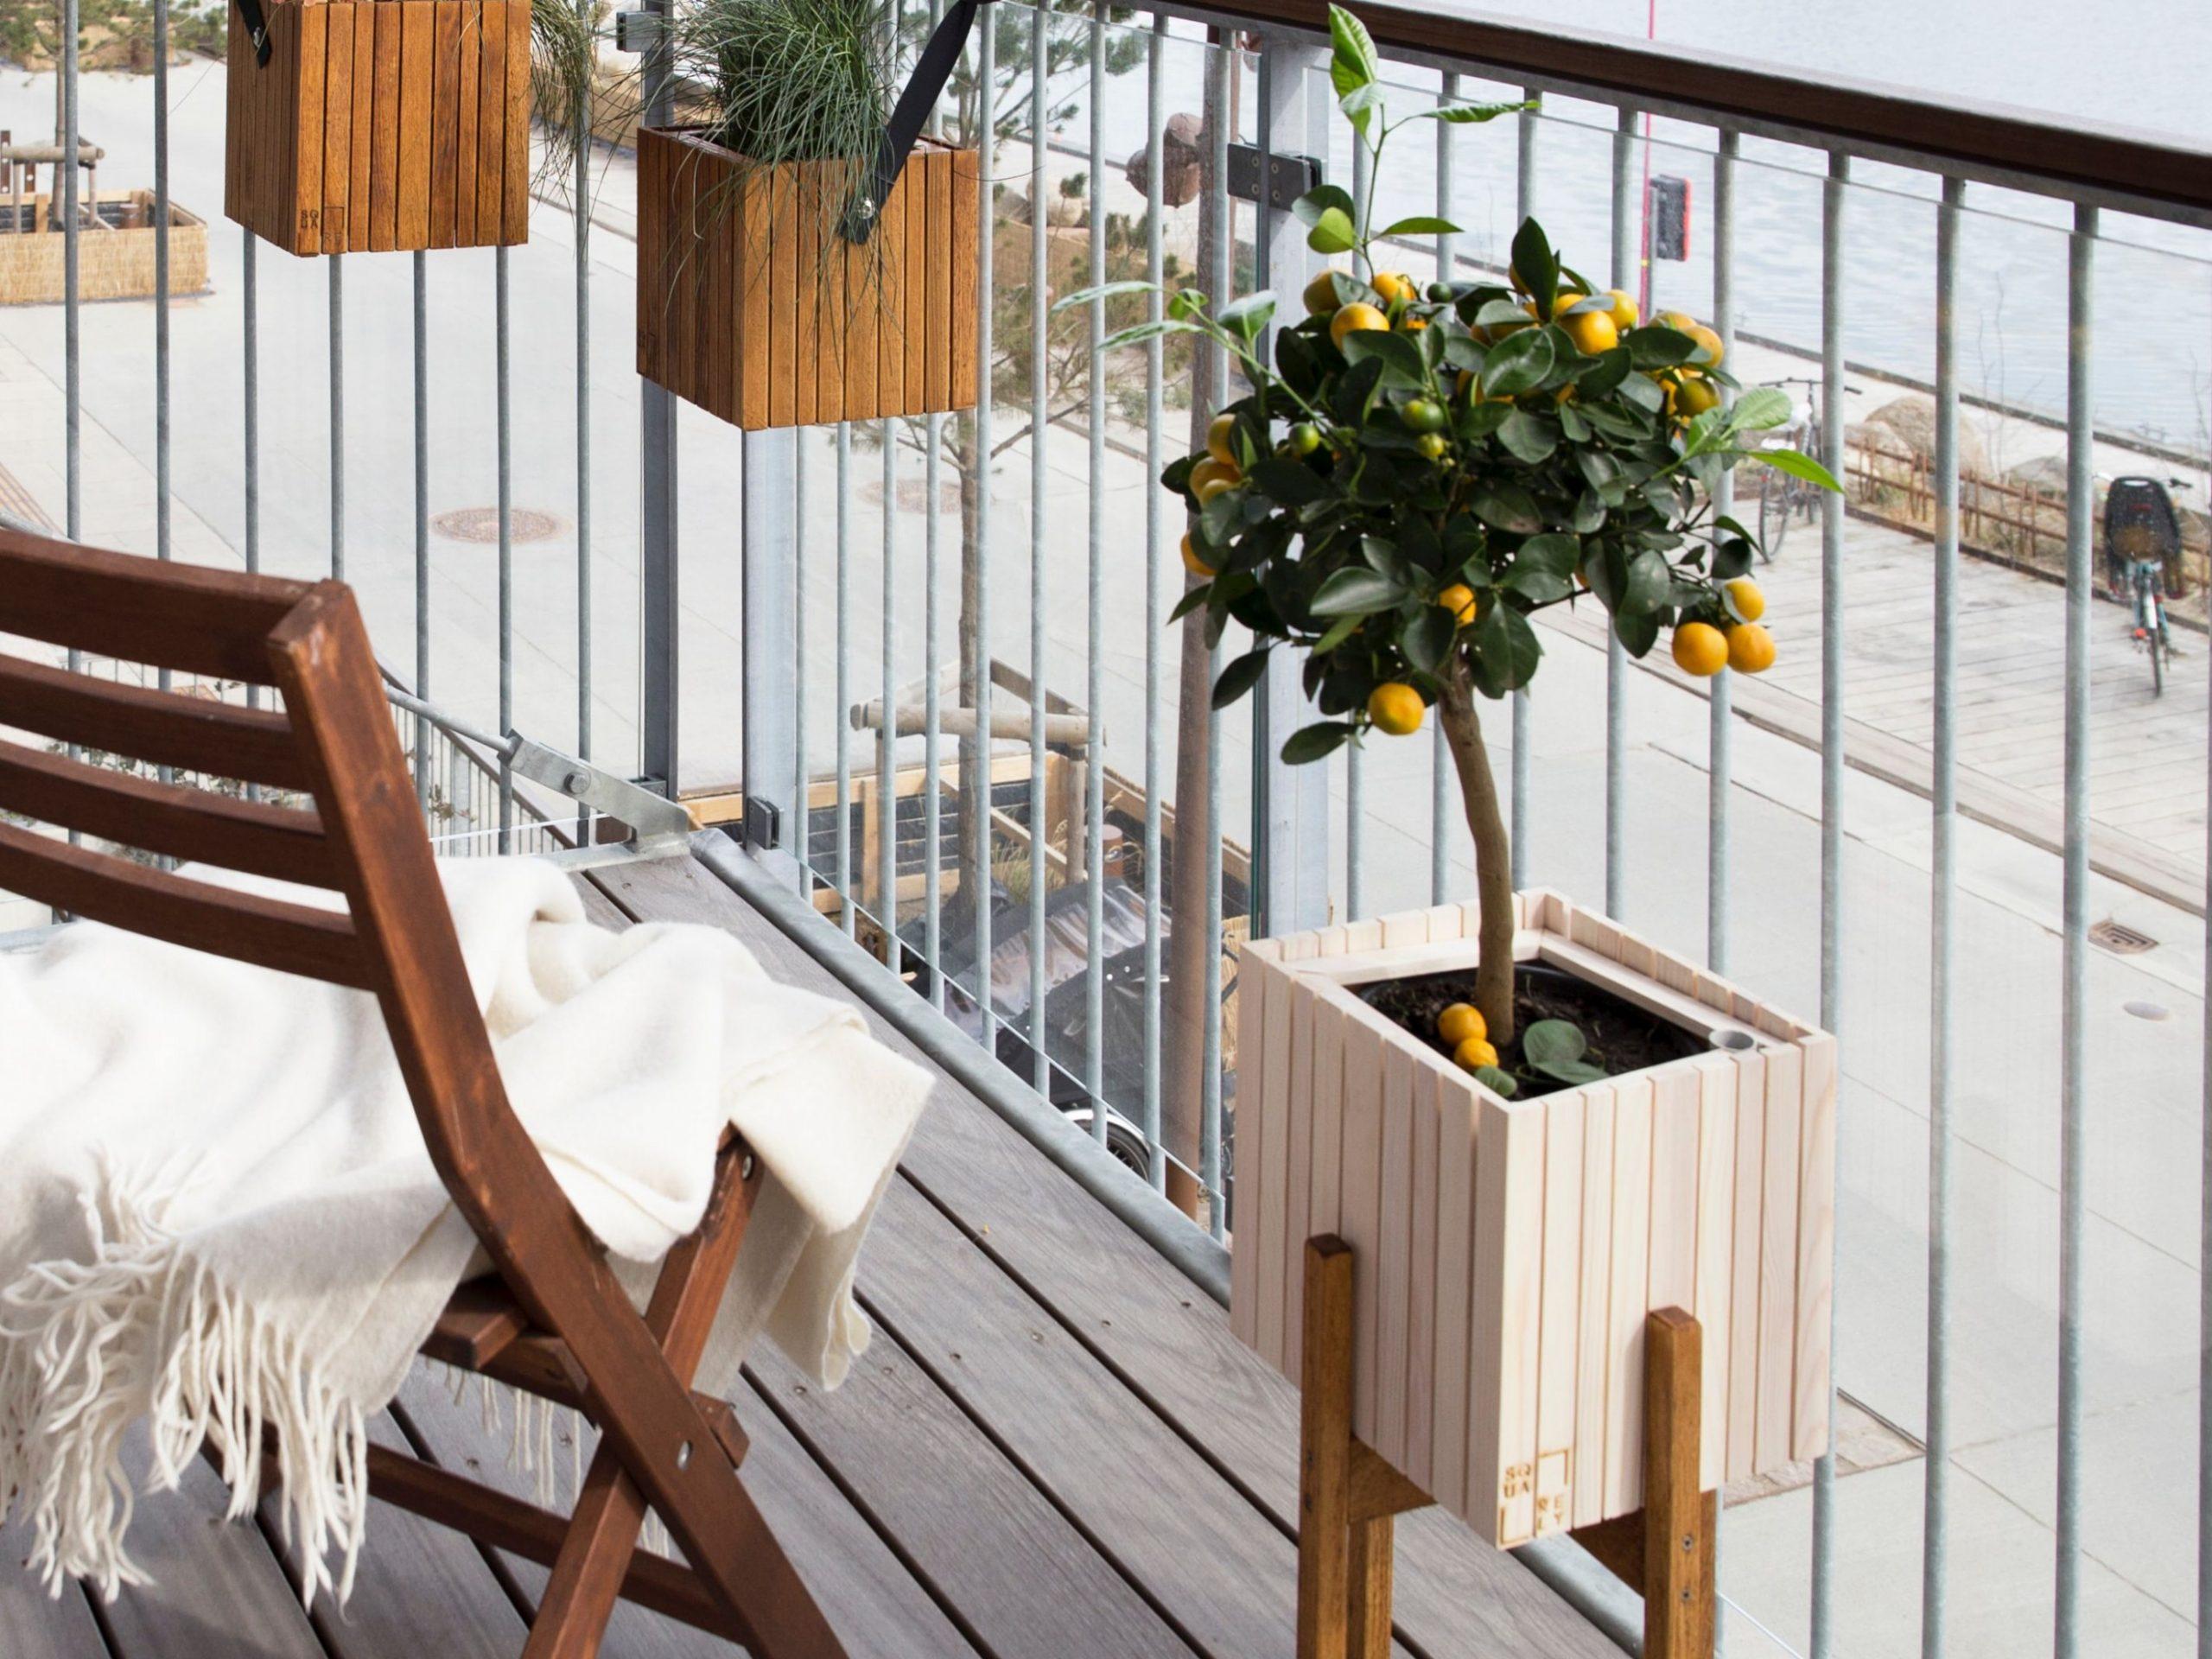 12 Ways to Maximize Your Small Balcony Space - Balcony Ideas For Apartments